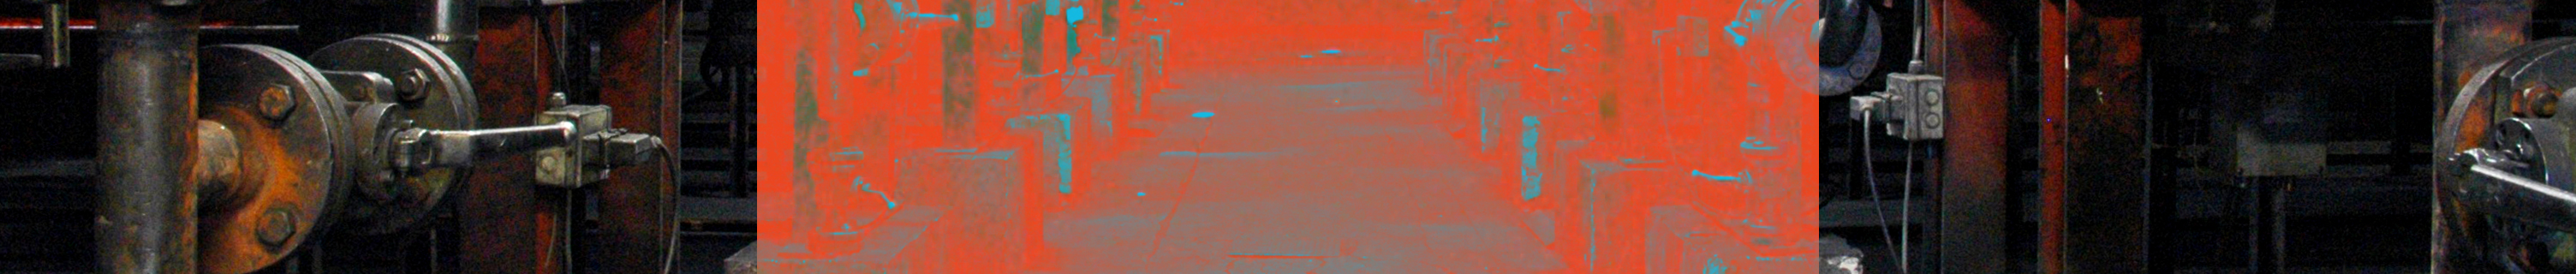 Header-slideshow_03